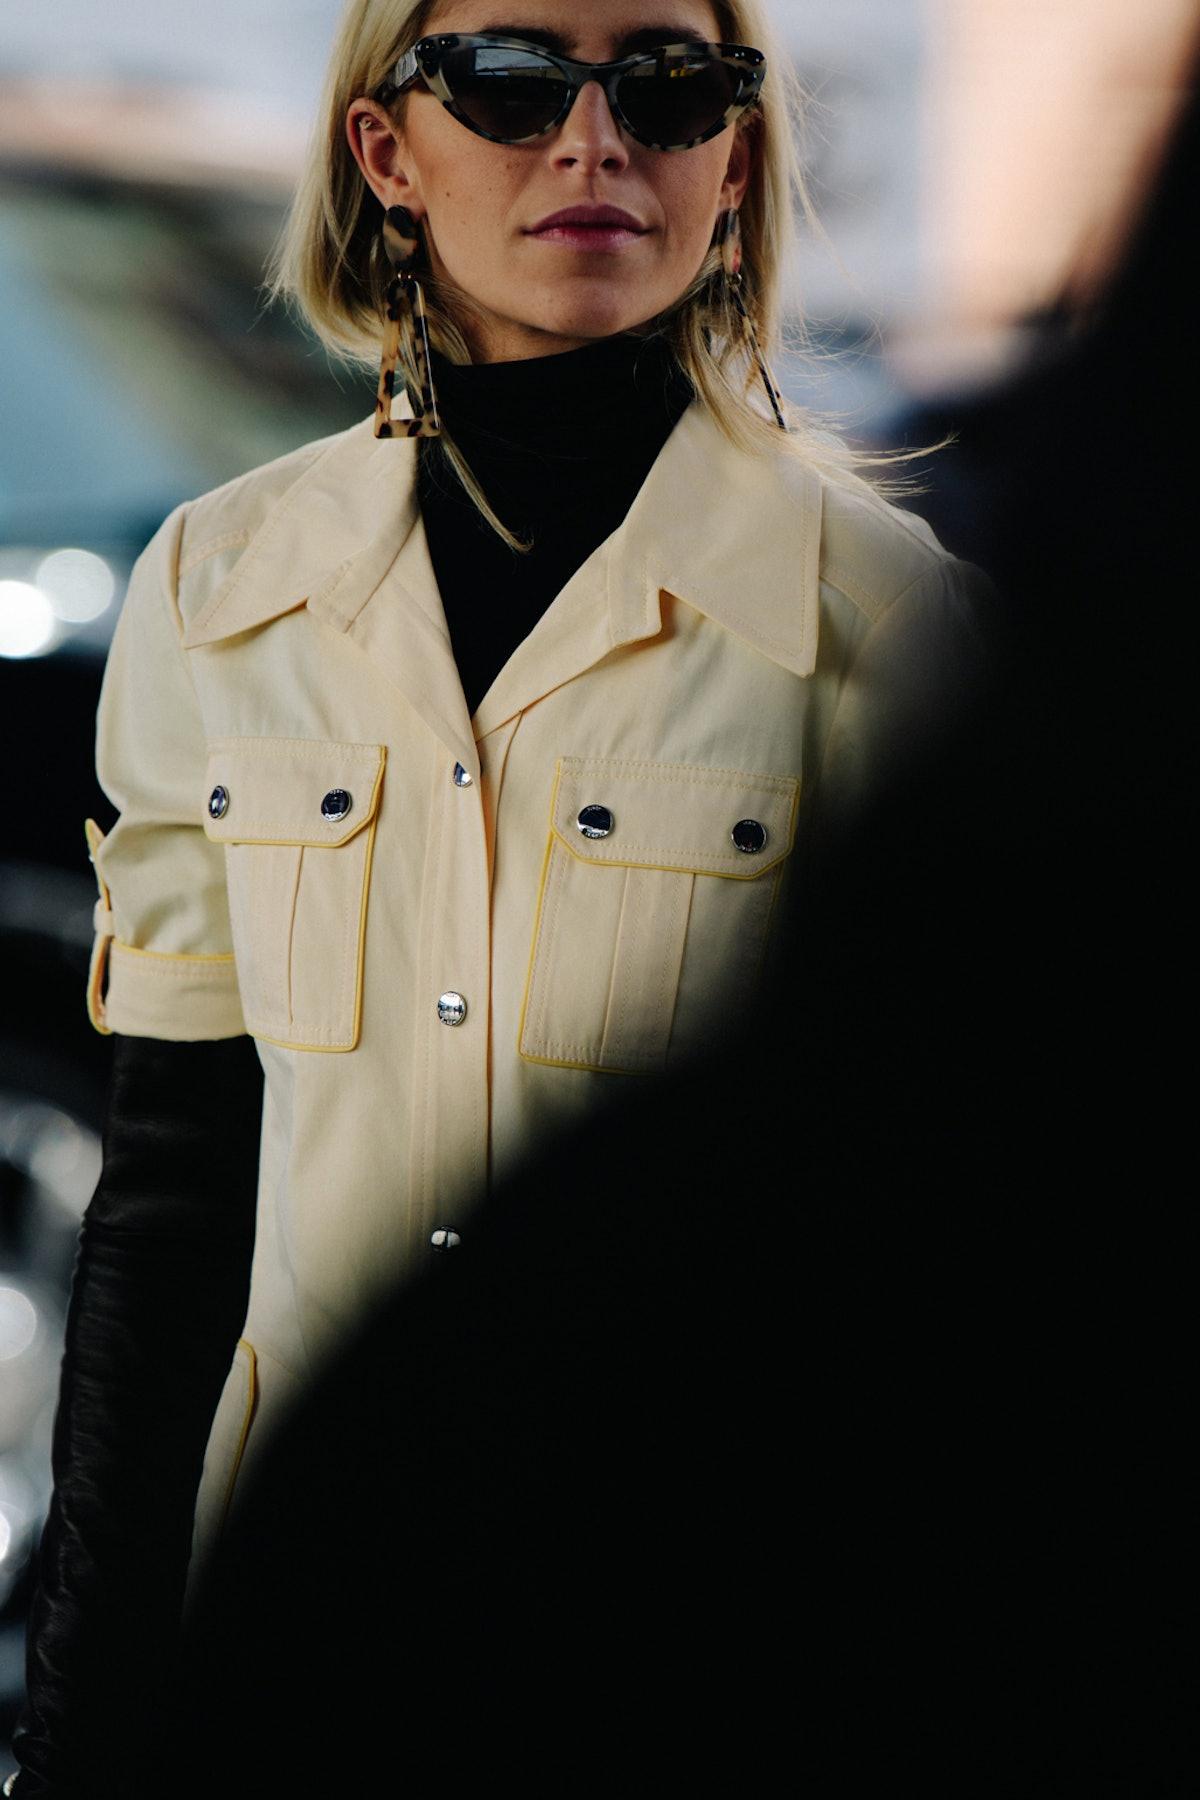 Adam-Katz-Sinding-W-Magazine-New-York-Fashion-Week-Fall-Winter-2019_AKS1397.jpg